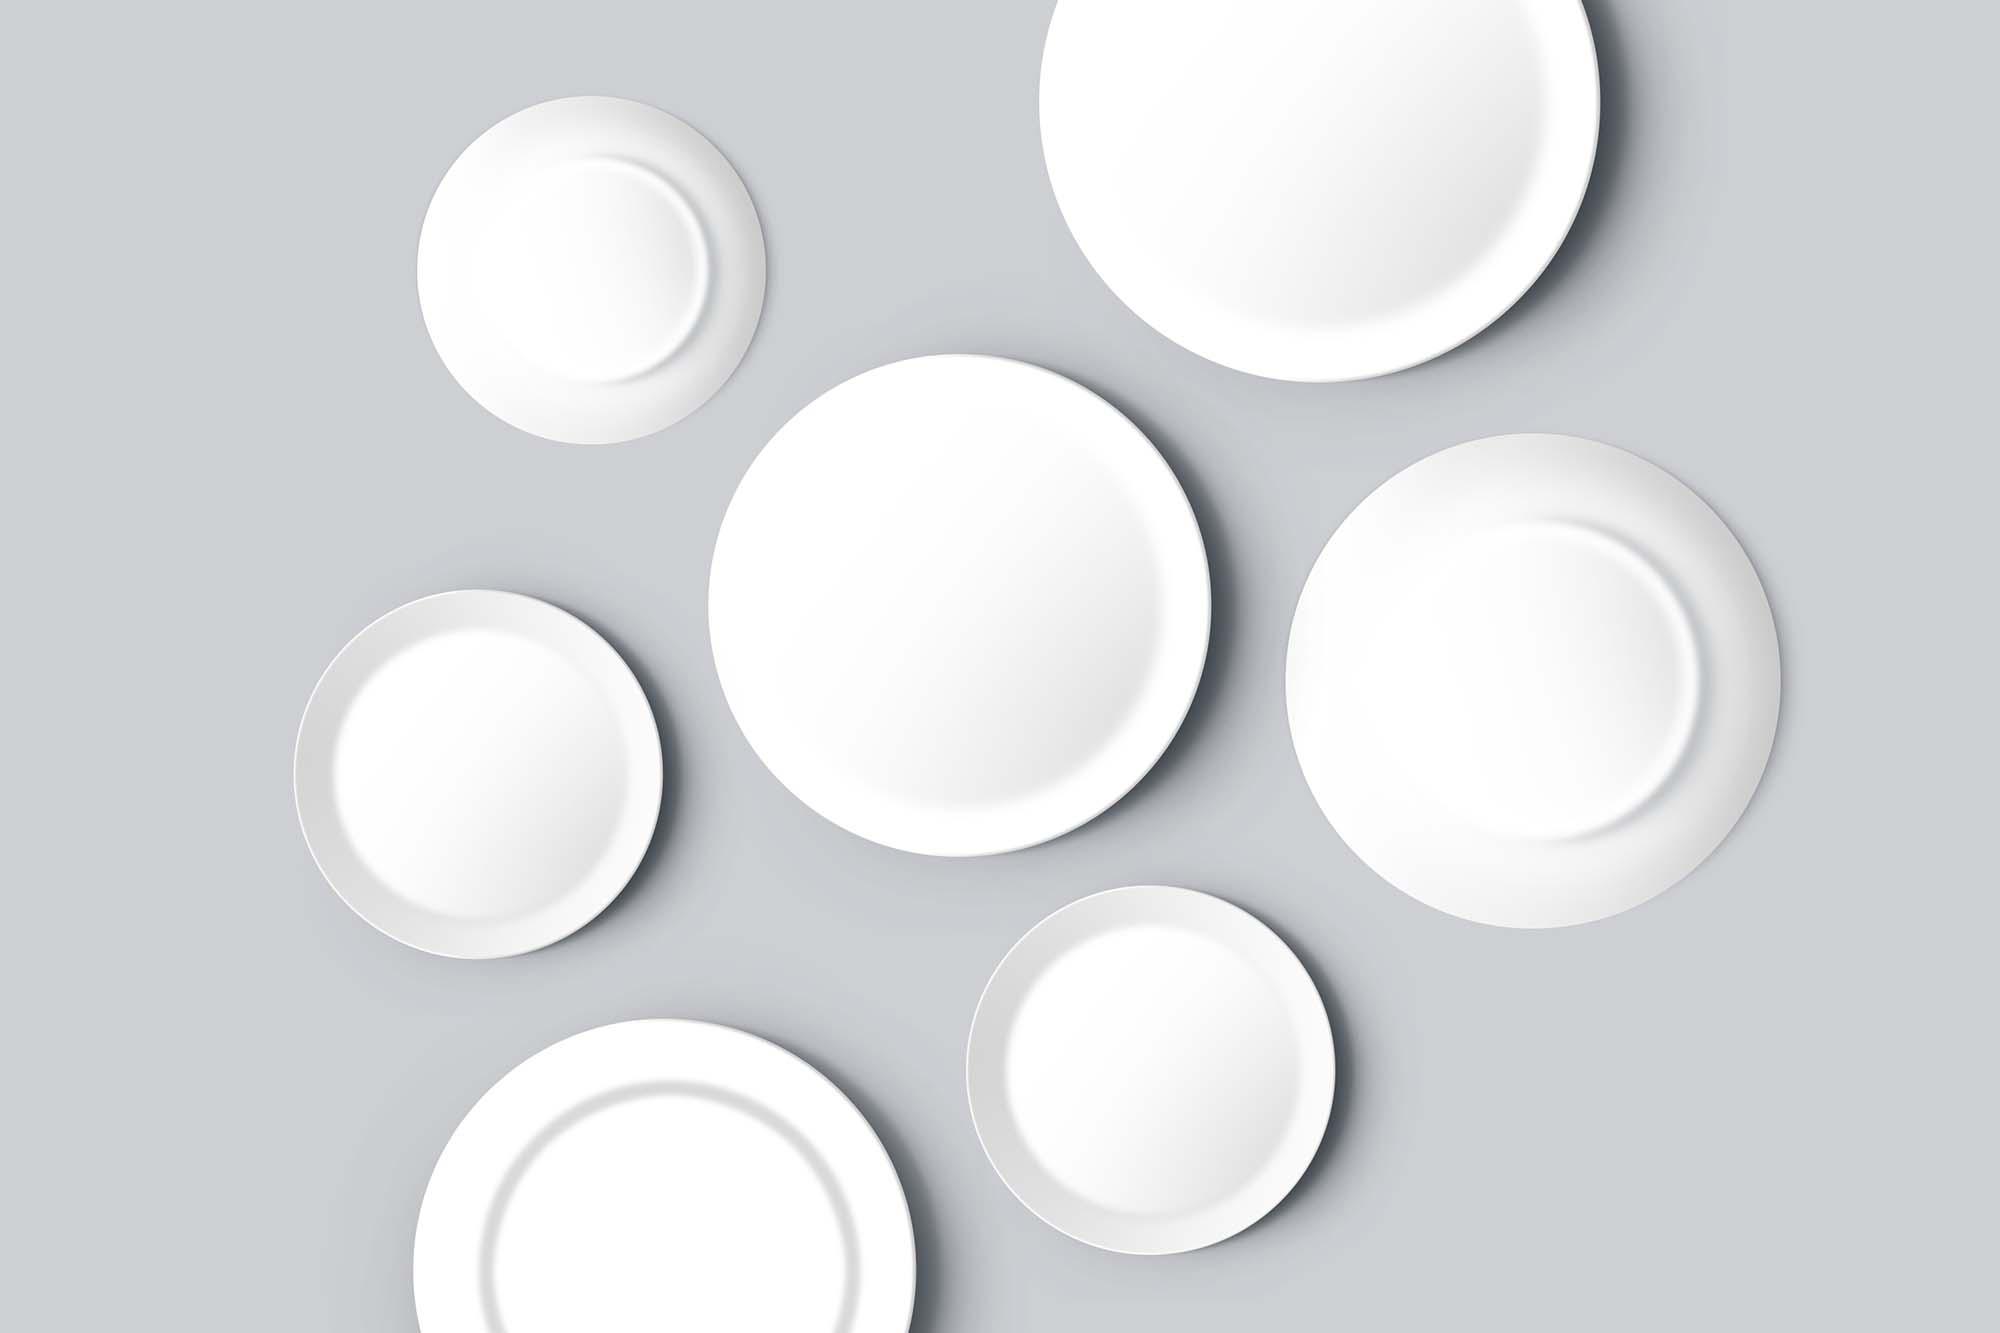 Plates Mockup 2